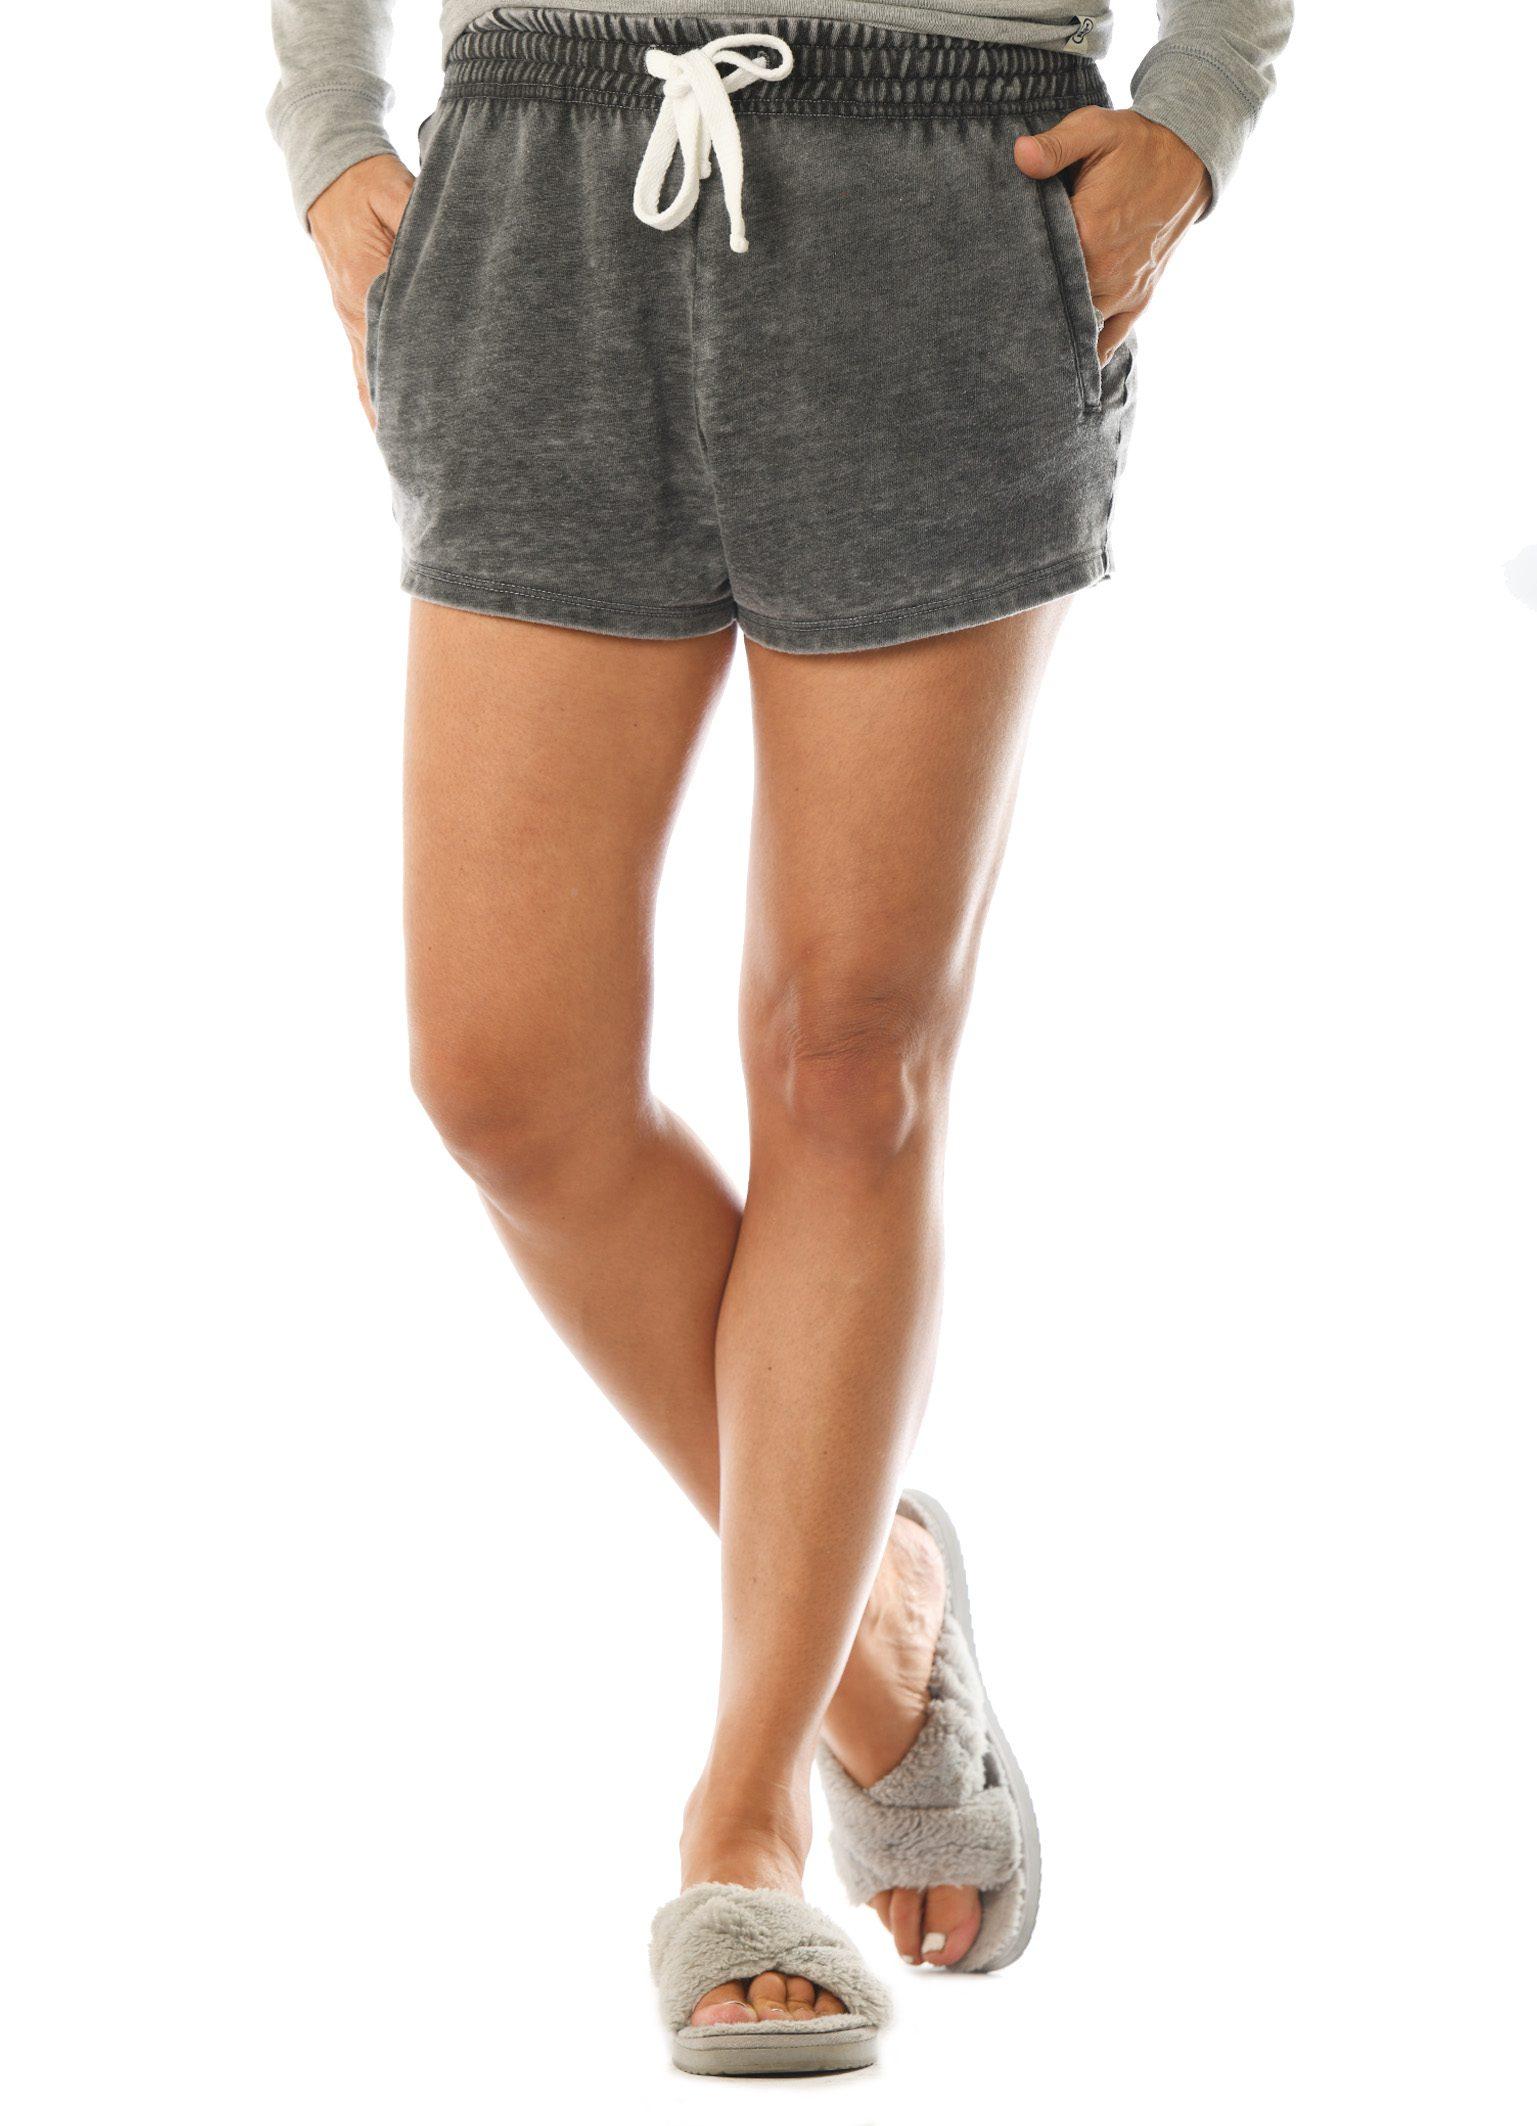 GG 362-B M Women's Worn Wash Shorts-Front